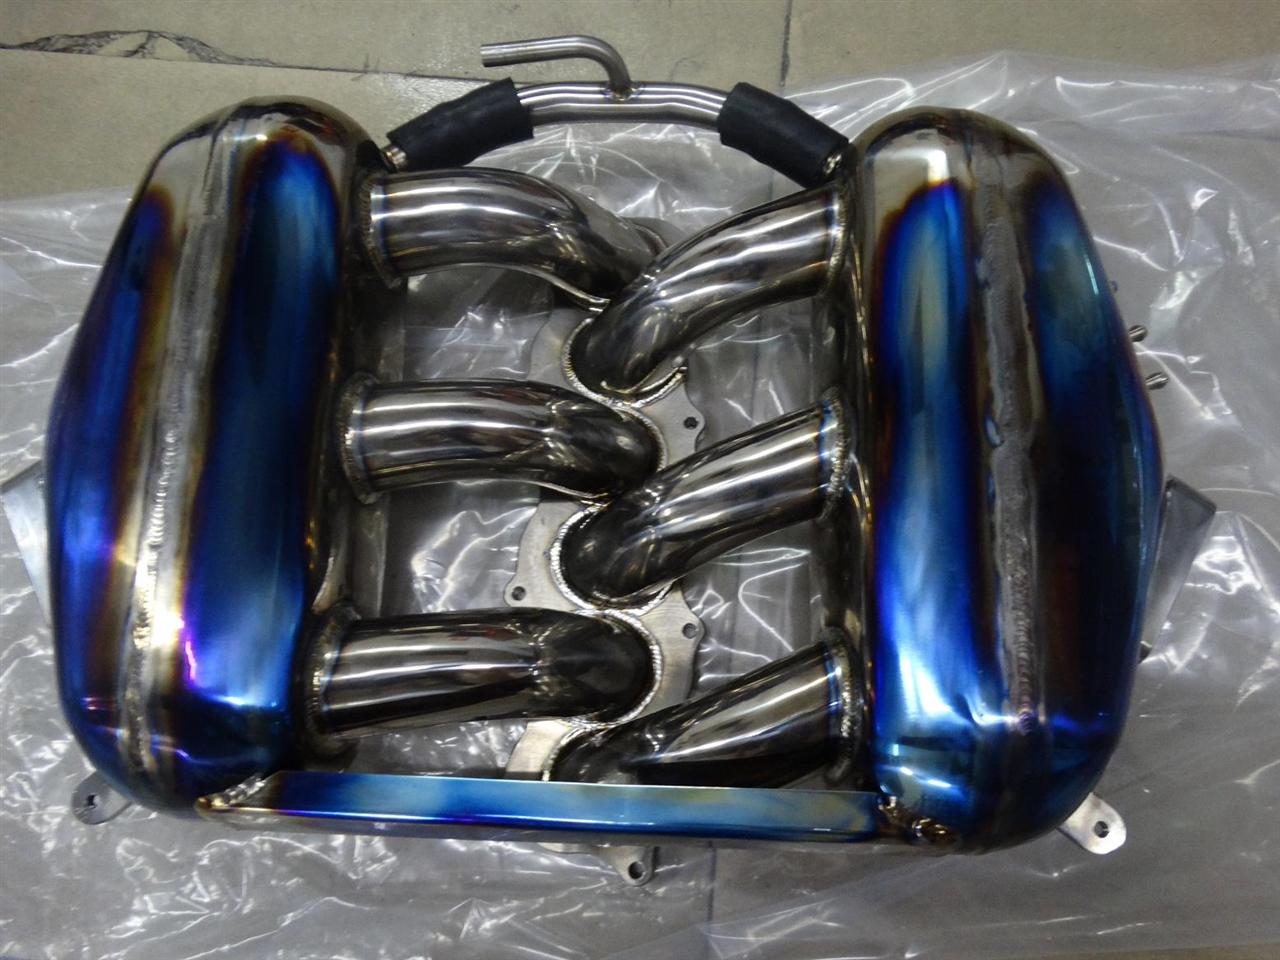 Nissan GTR R35 Skyline尼桑钛合金进气头焦进气管